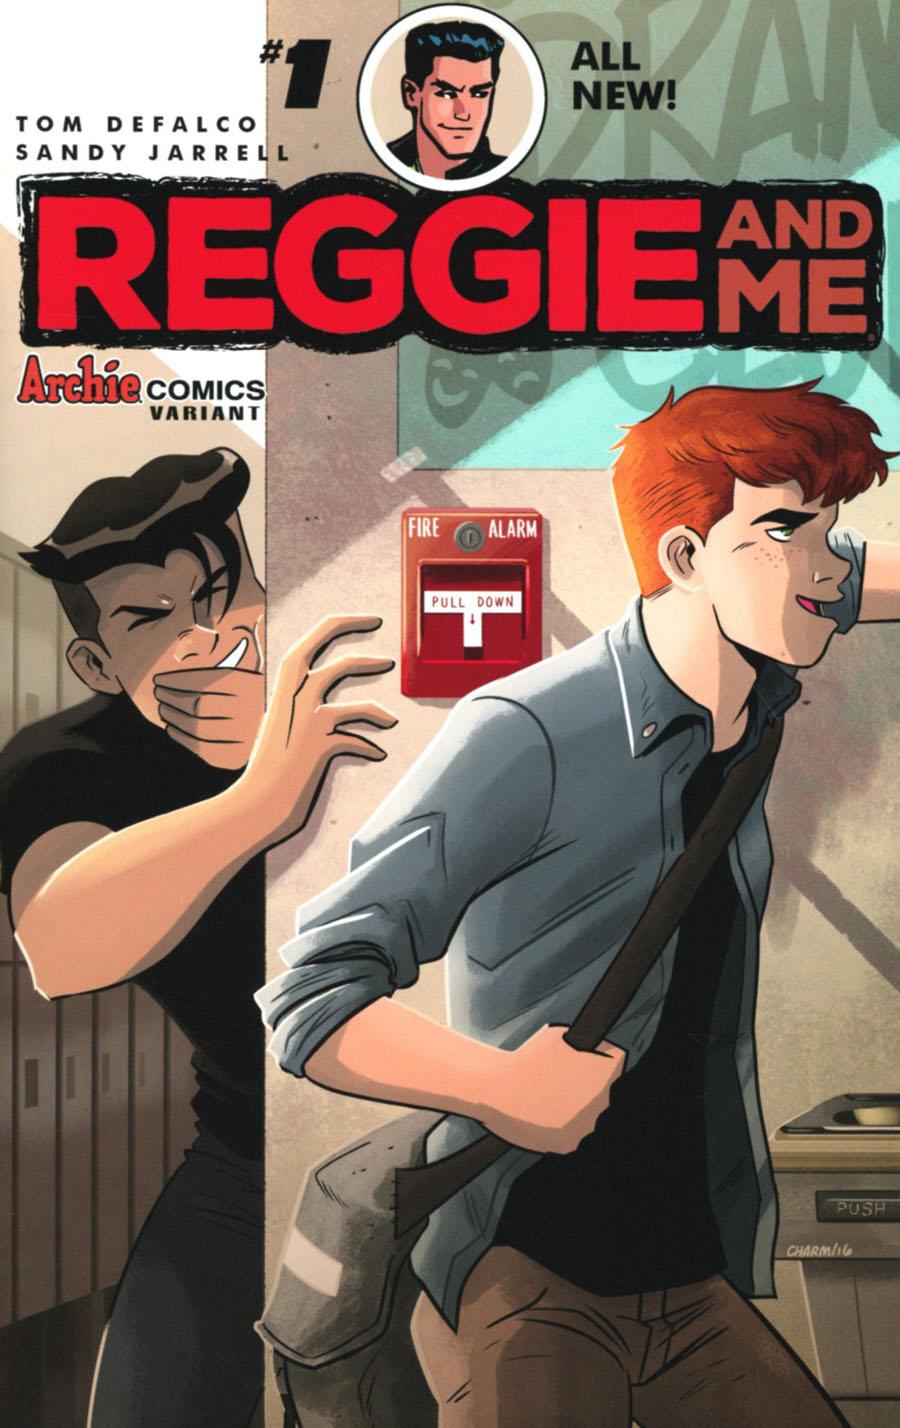 Reggie And Me Vol 2 #1 Cover C Variant Derek Charm Cover